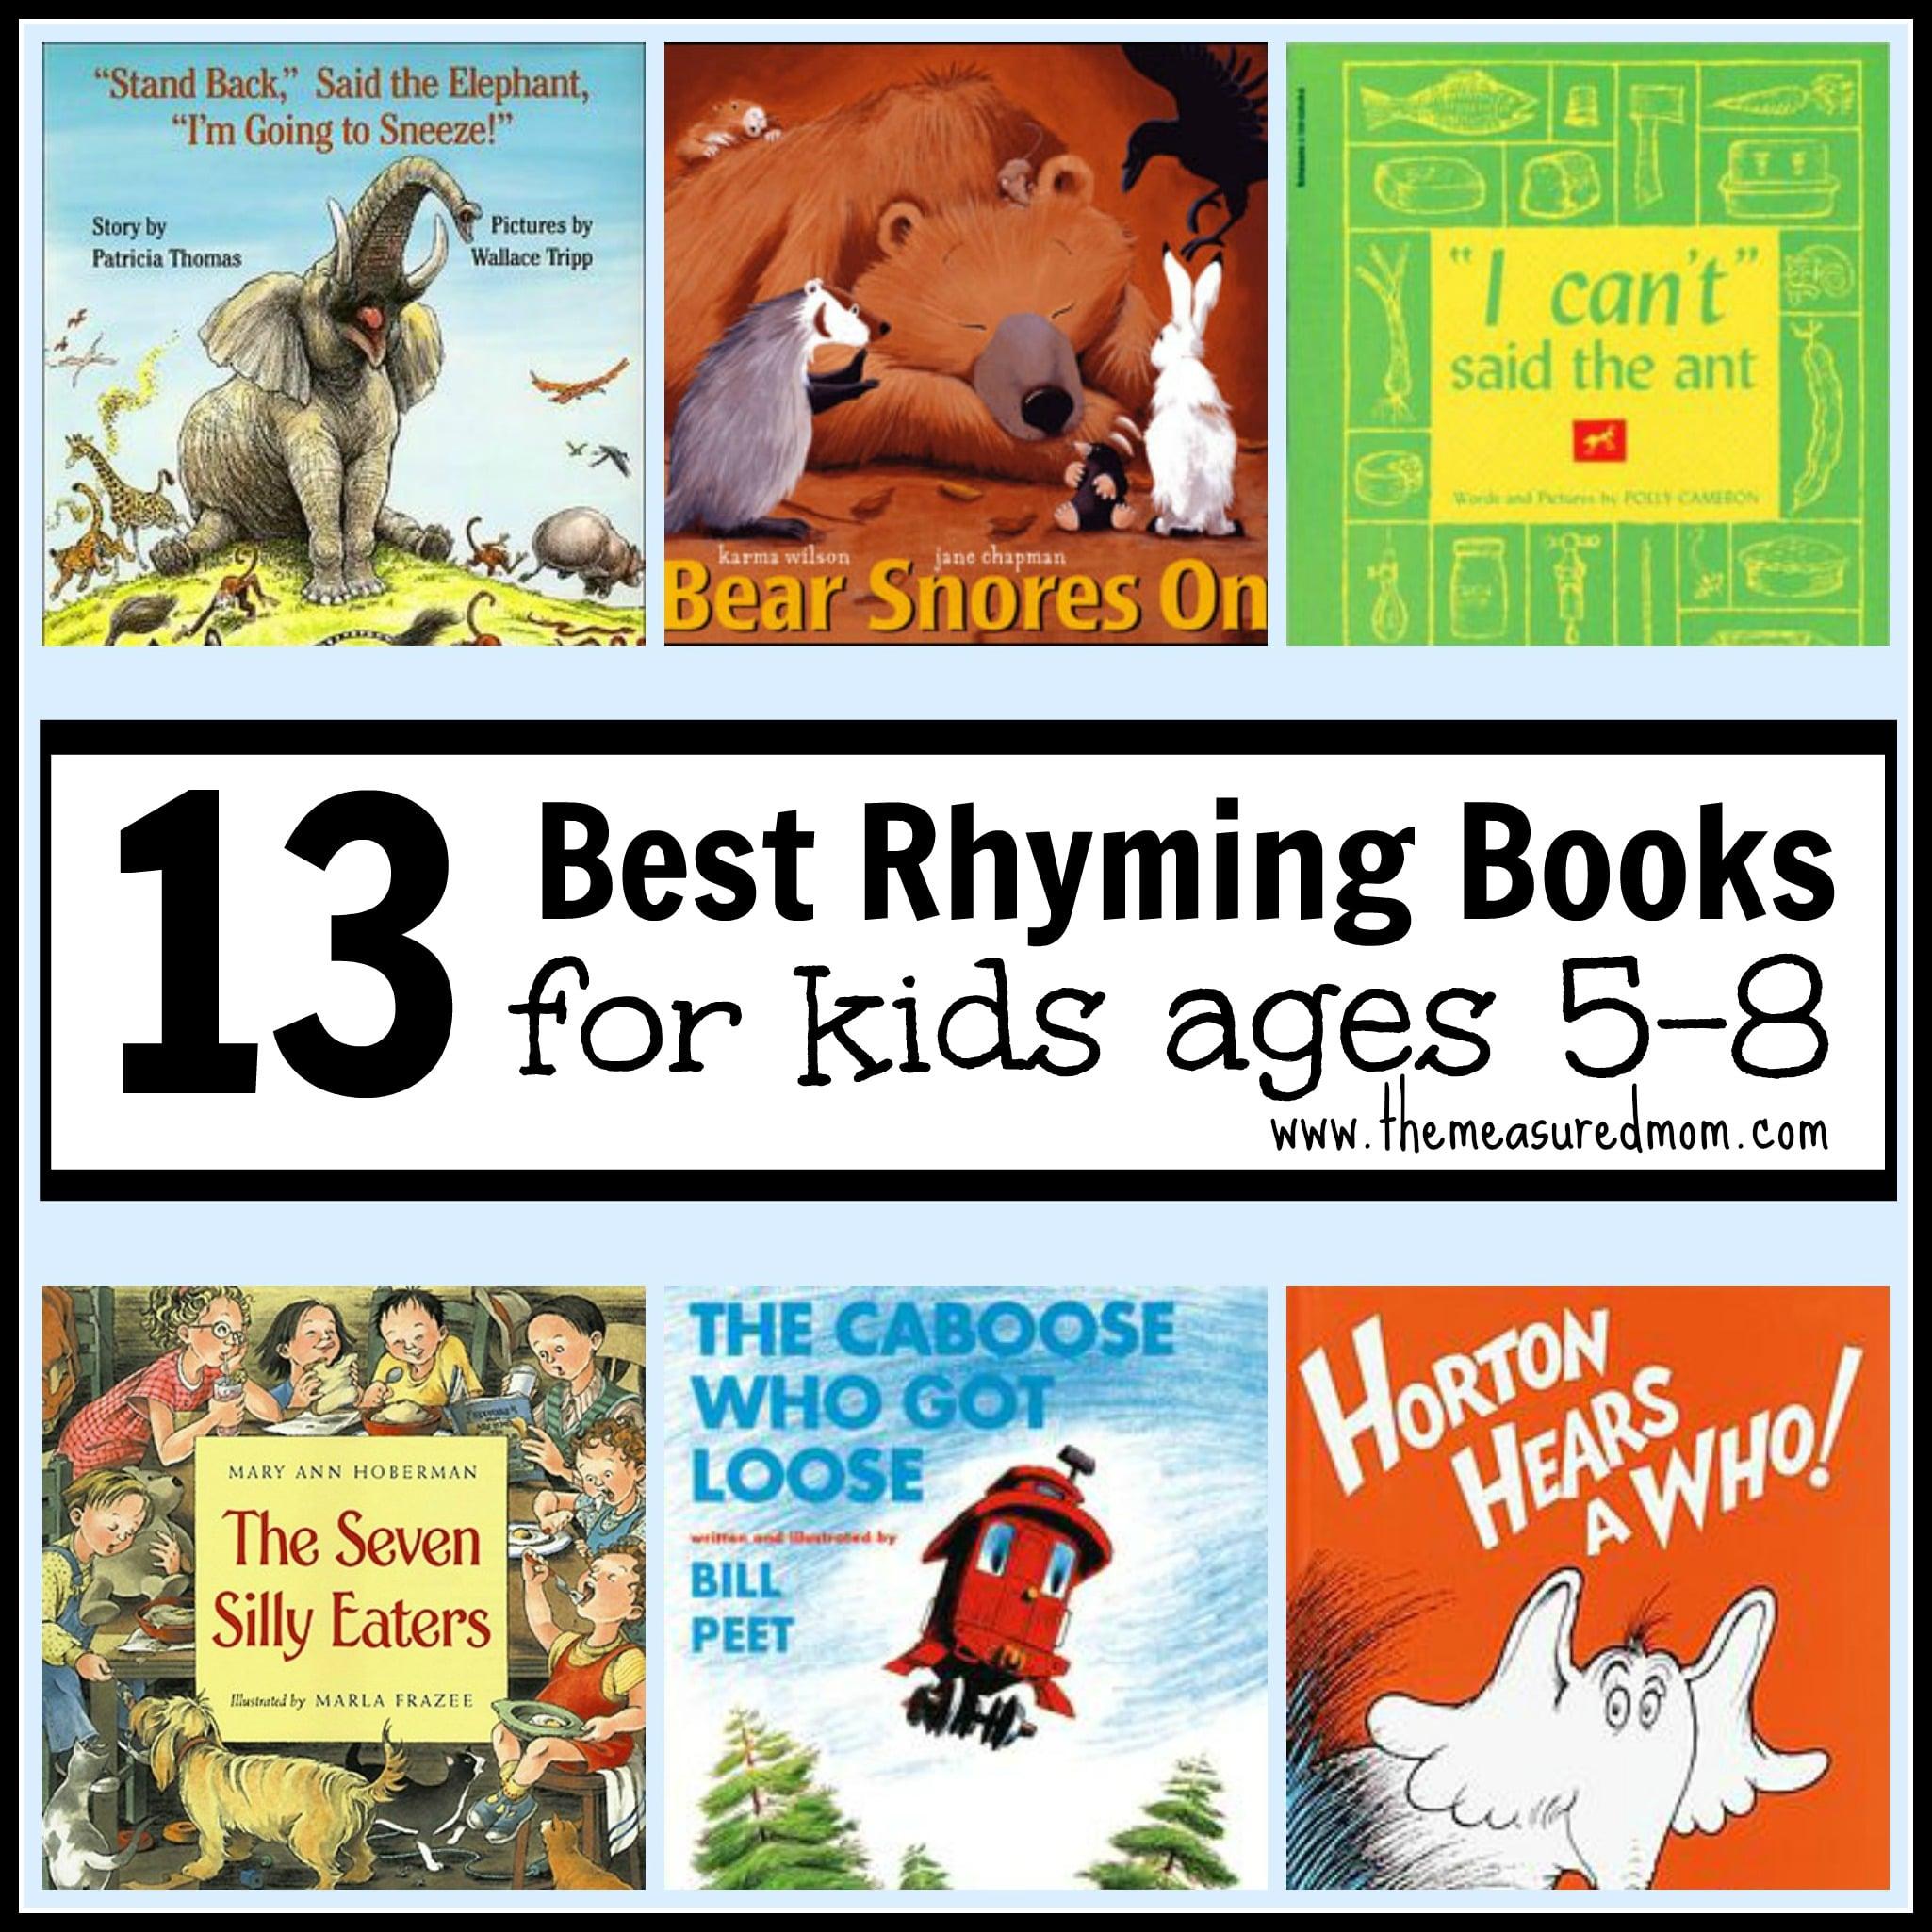 Worksheet Rhyme Words For Kindergarten best rhyming books for kids ages 5 8 the measured mom